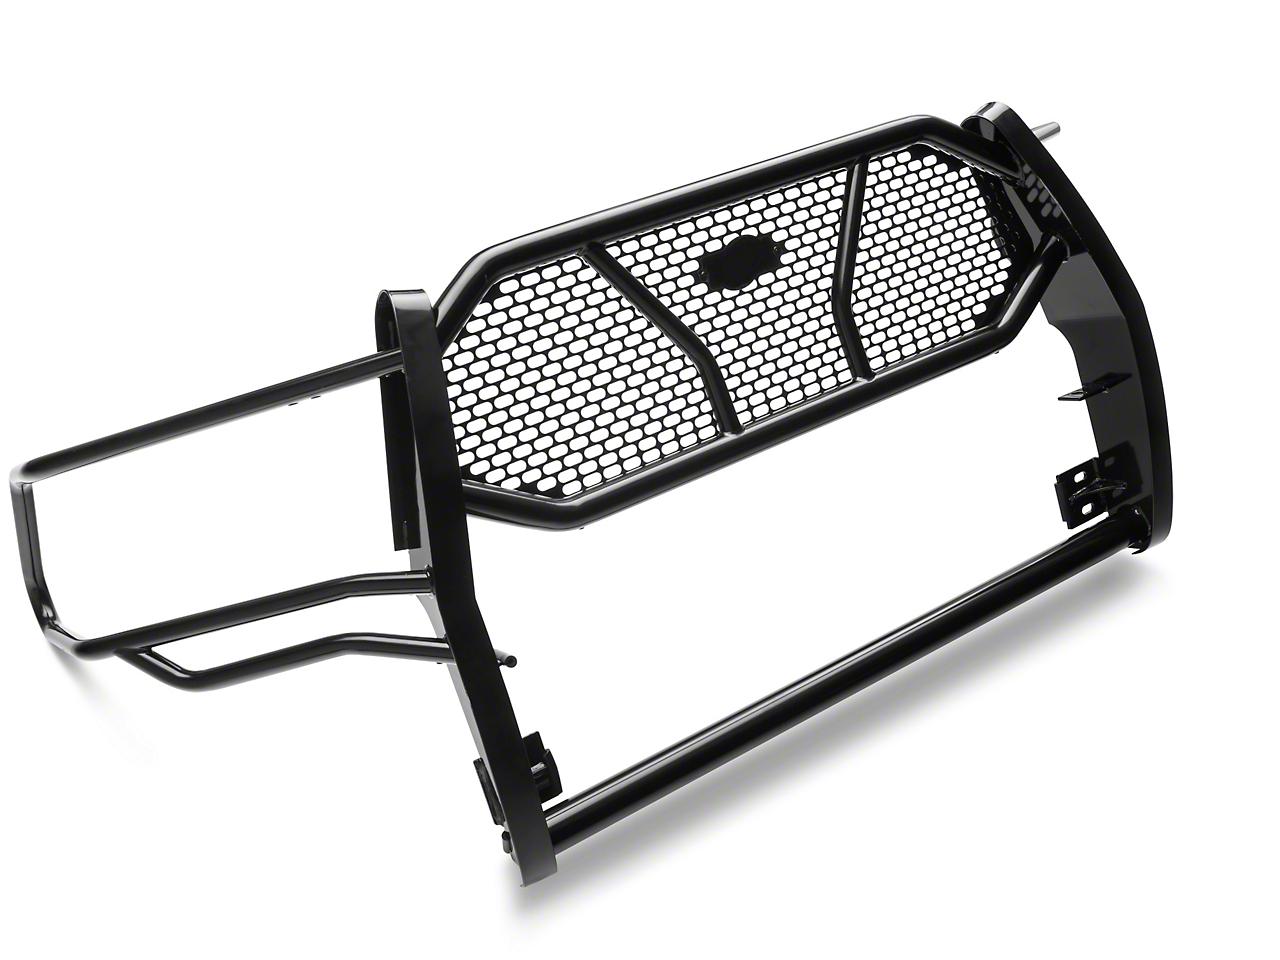 Steel Craft HD Grille Guard - Black (09-18 RAM 1500, Excluding Rebel)